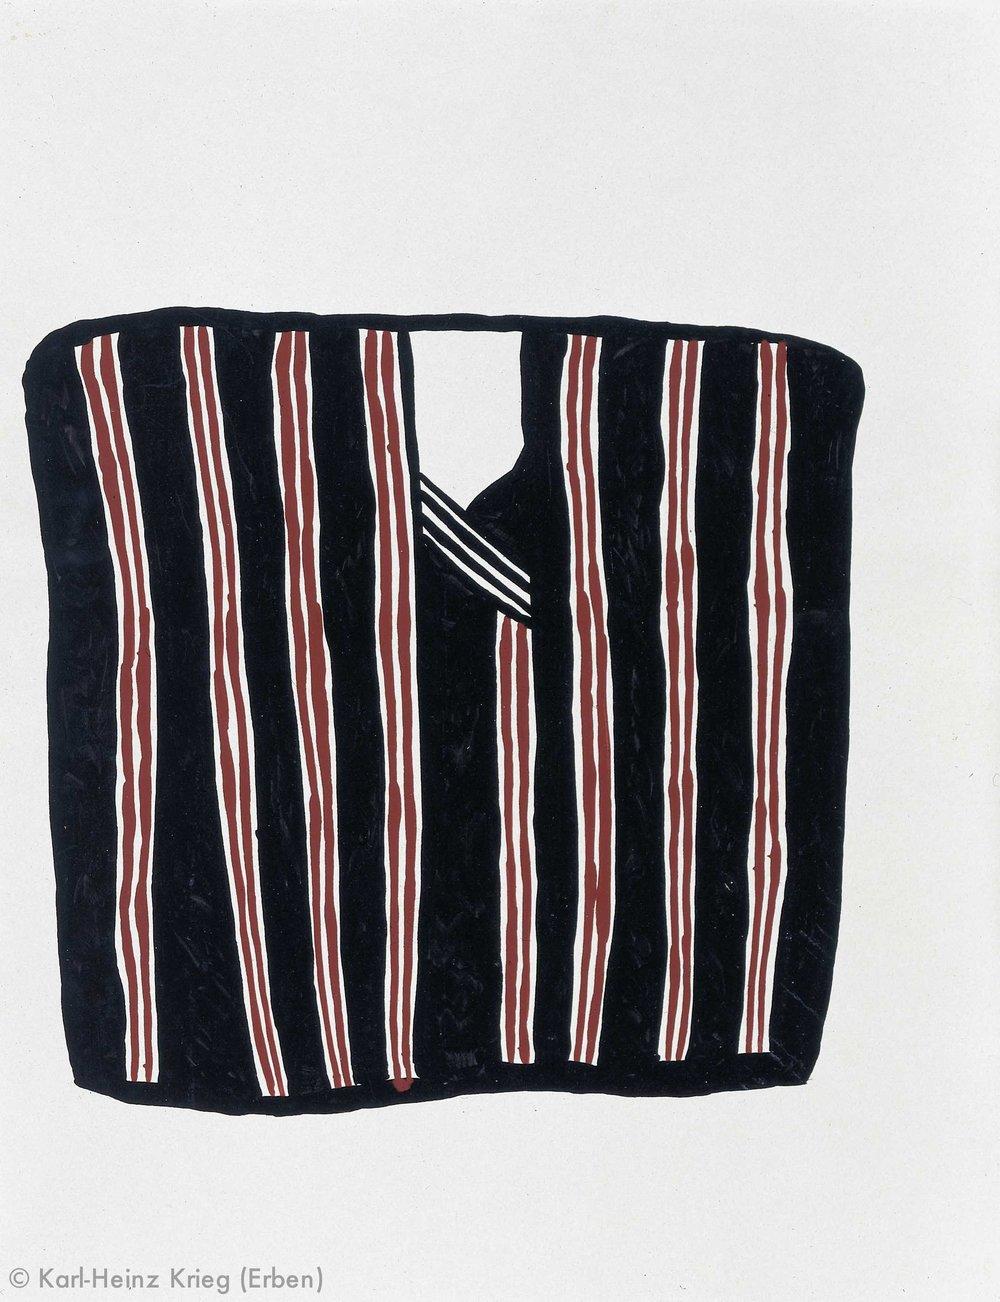 Pévé Zoumanigi Dobogolai, 1990 Dispersionsfarbe/Papier, grundiert 64,5 x 50 cm Werknr. 39-1990/44